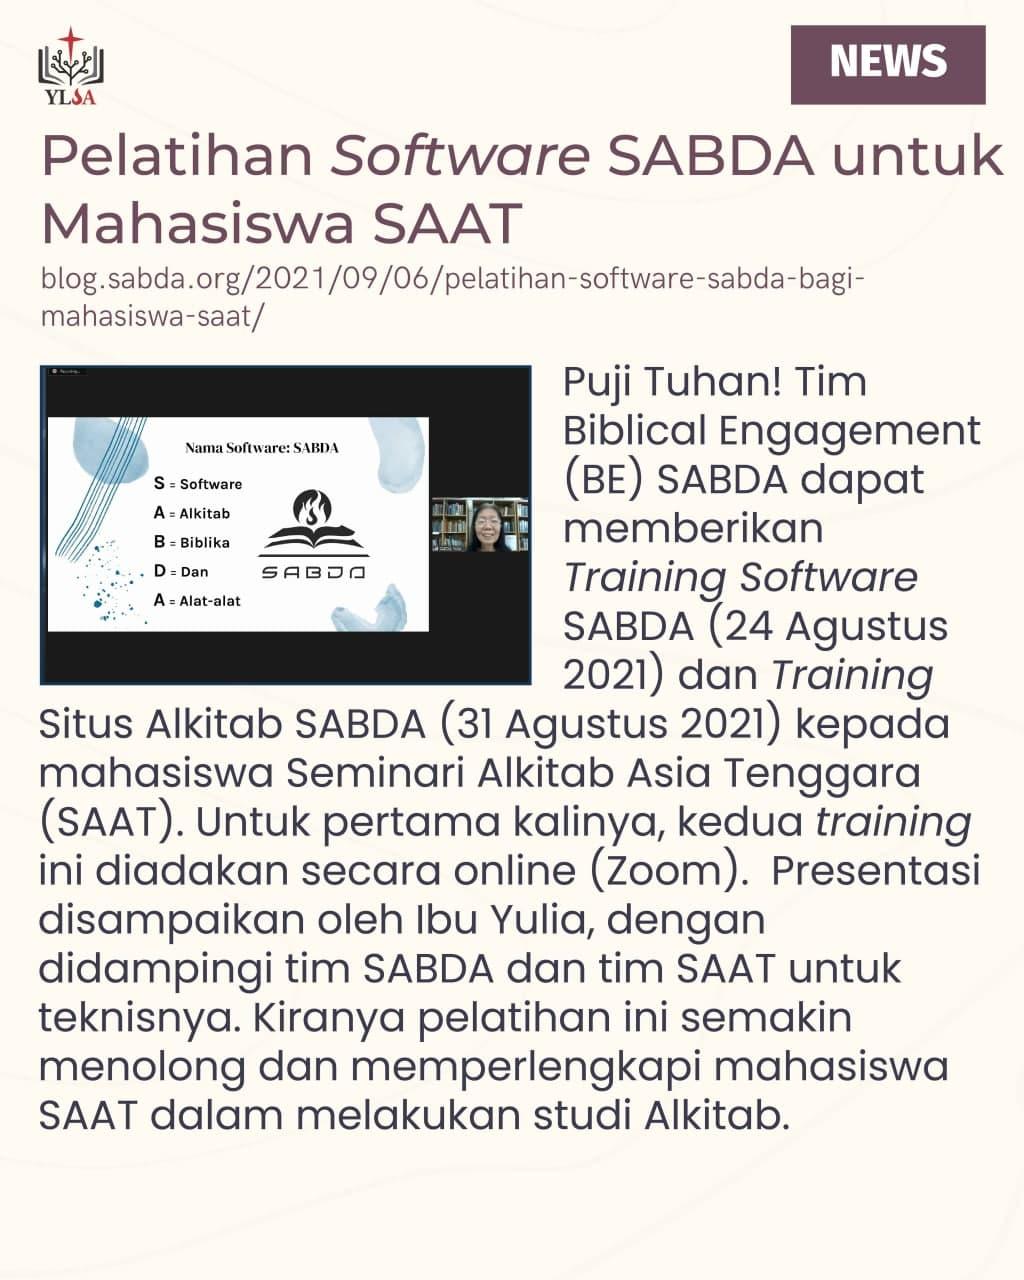 Puji Tuhan! Tim Biblical Engagement (BE) SABDA dapat memberikan Training Software SABDA (24 Agustus 2021) dan Training Situs Alkitab SABDA (31 Agustus 2021) kepada mahasiswa SAAT.